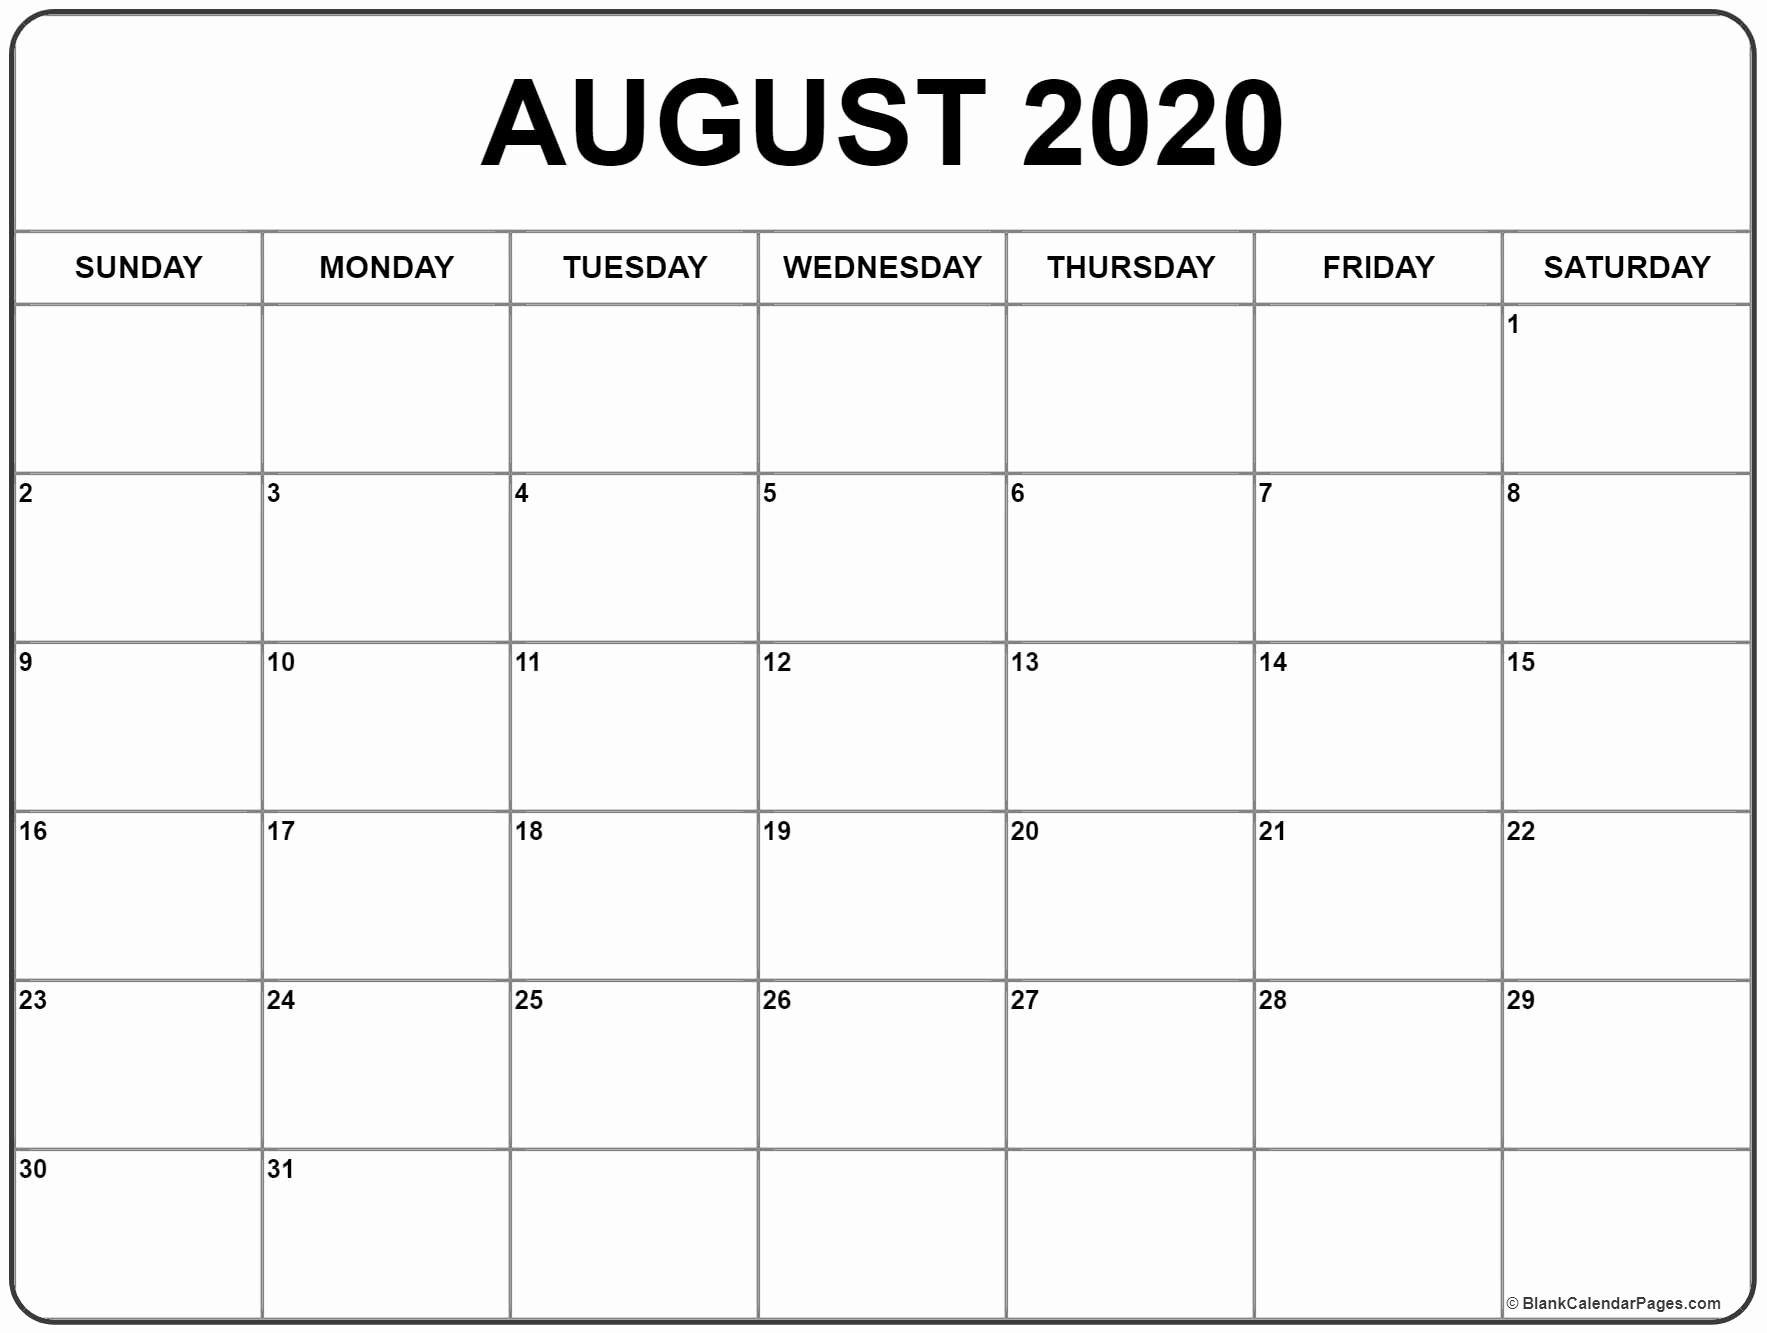 August 2020 Calendar Blank With Images Calendar Printables